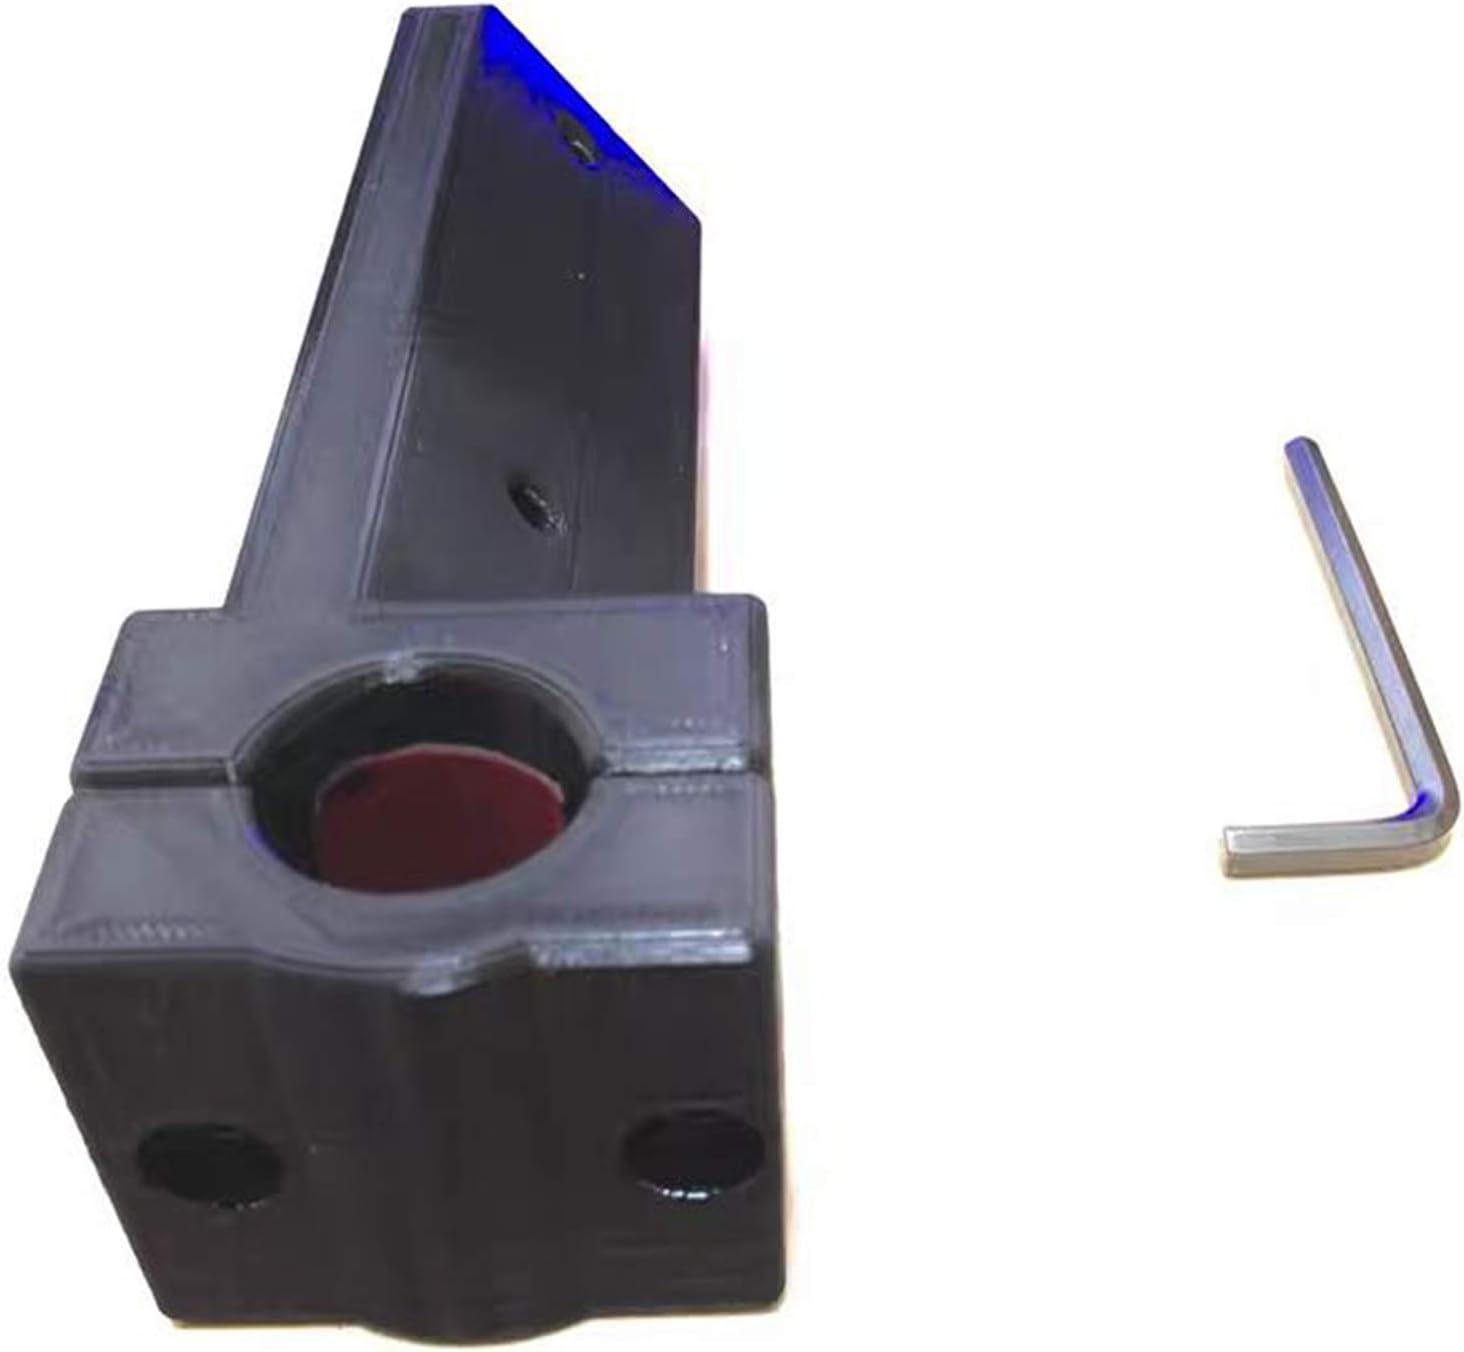 LICHIFIT Soporte de palanca de cambios con cambio de marchas Soporte RHD TH8A para silla de desafío Playseat para Logitech G25 G27 G29 G920